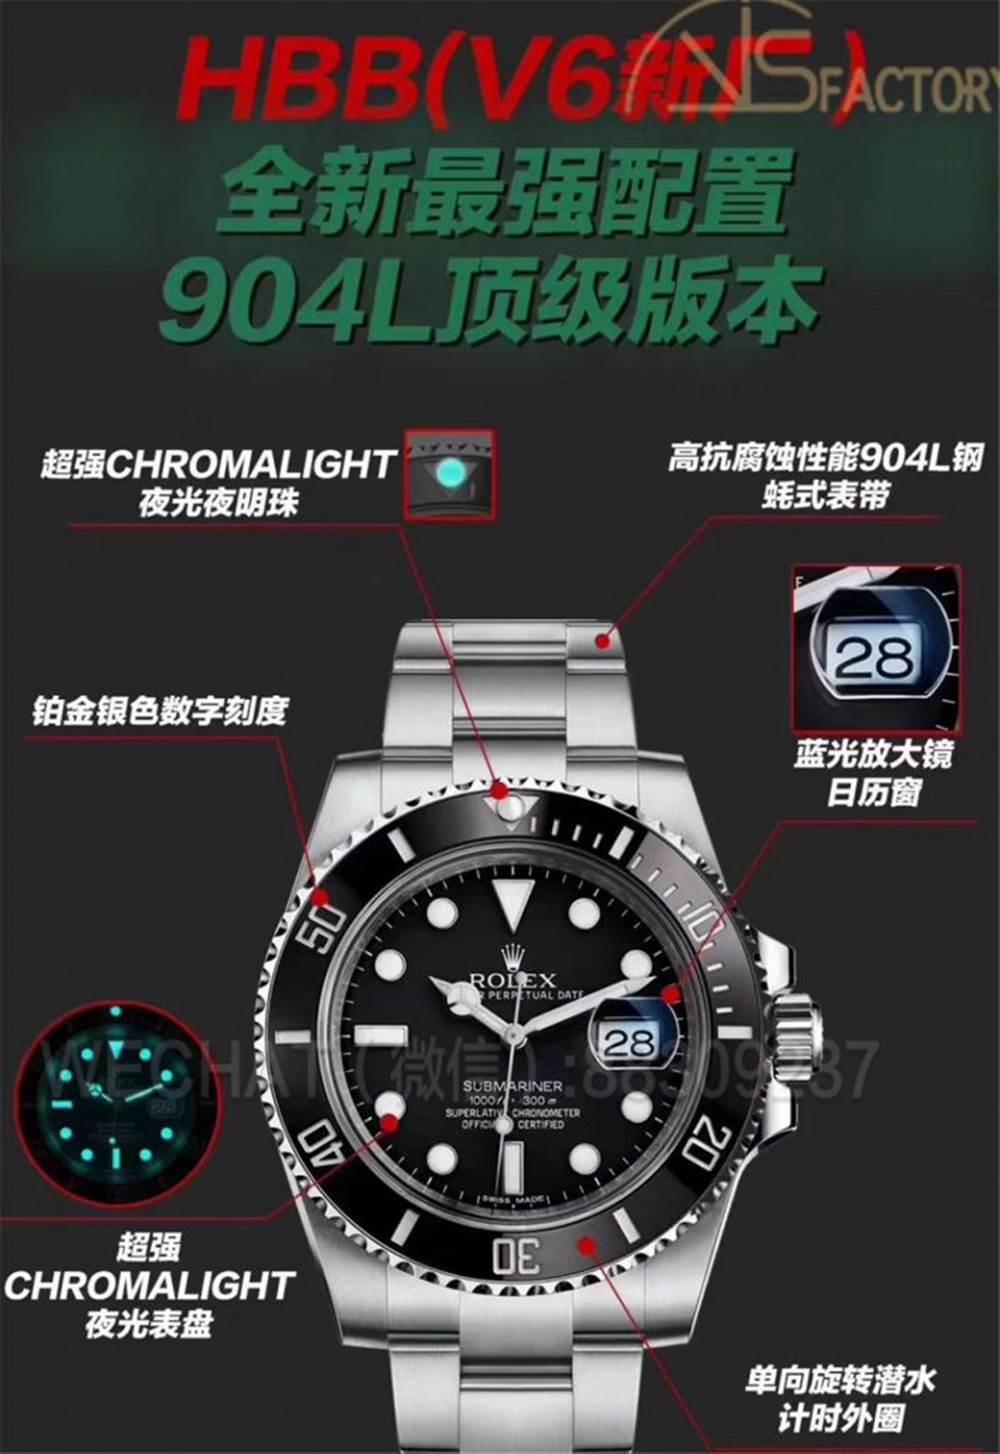 HBBV6厂劳力士水鬼「904L」最新顶级版本评测